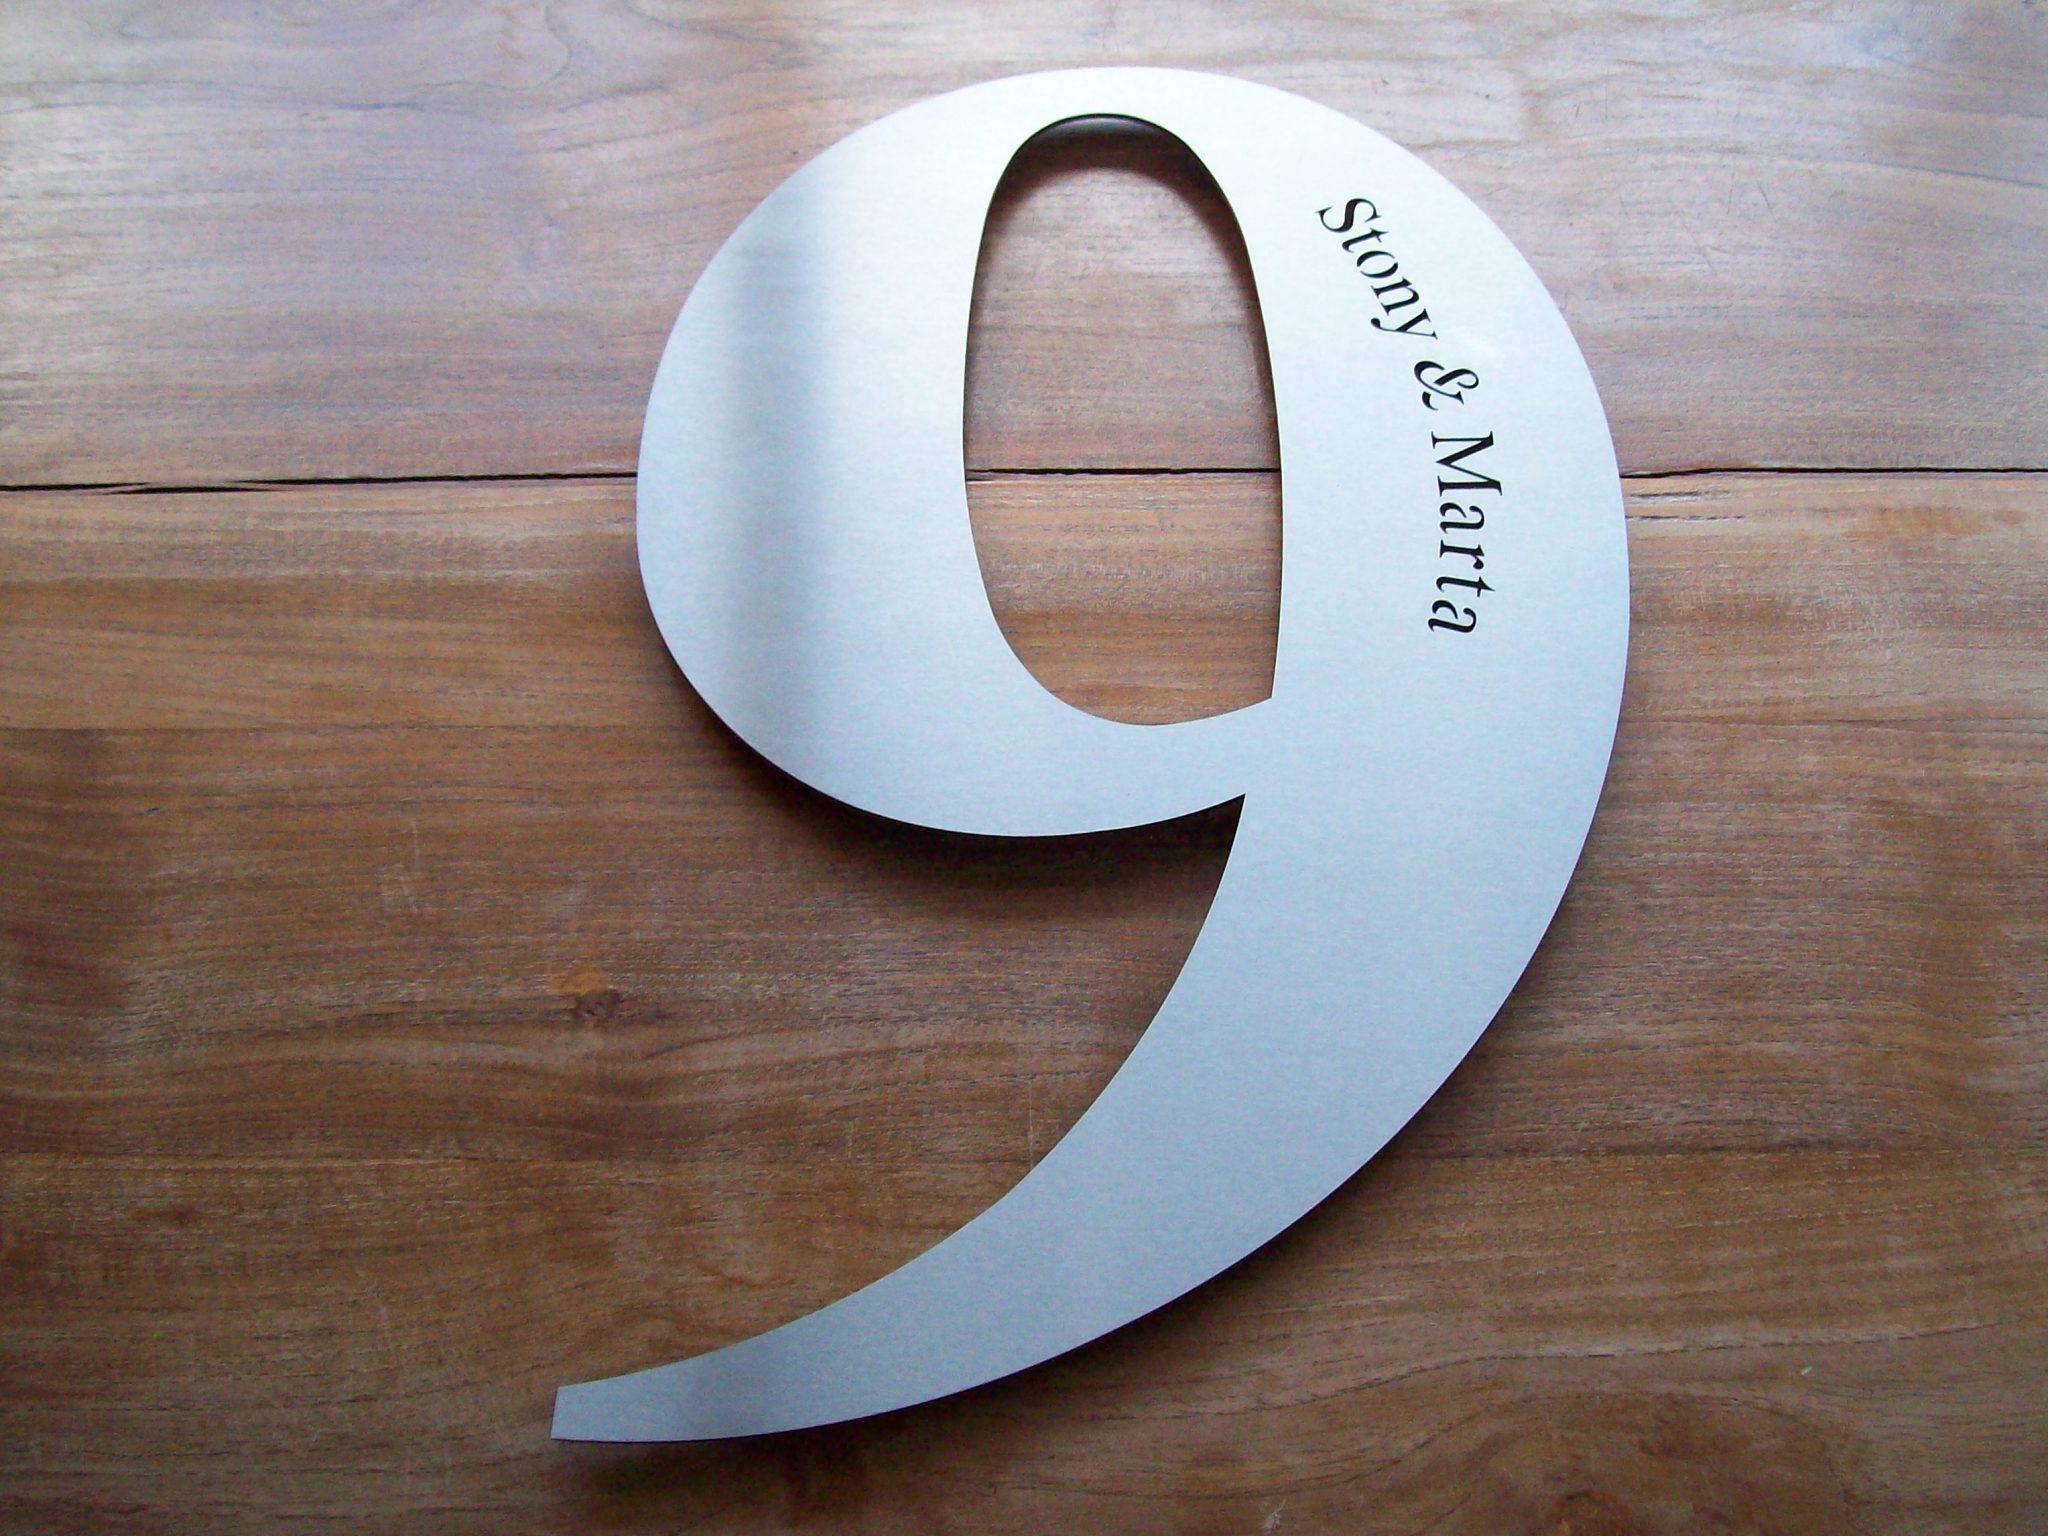 Huisnummer uit losse cijfers RVS316 2mm dik met naam